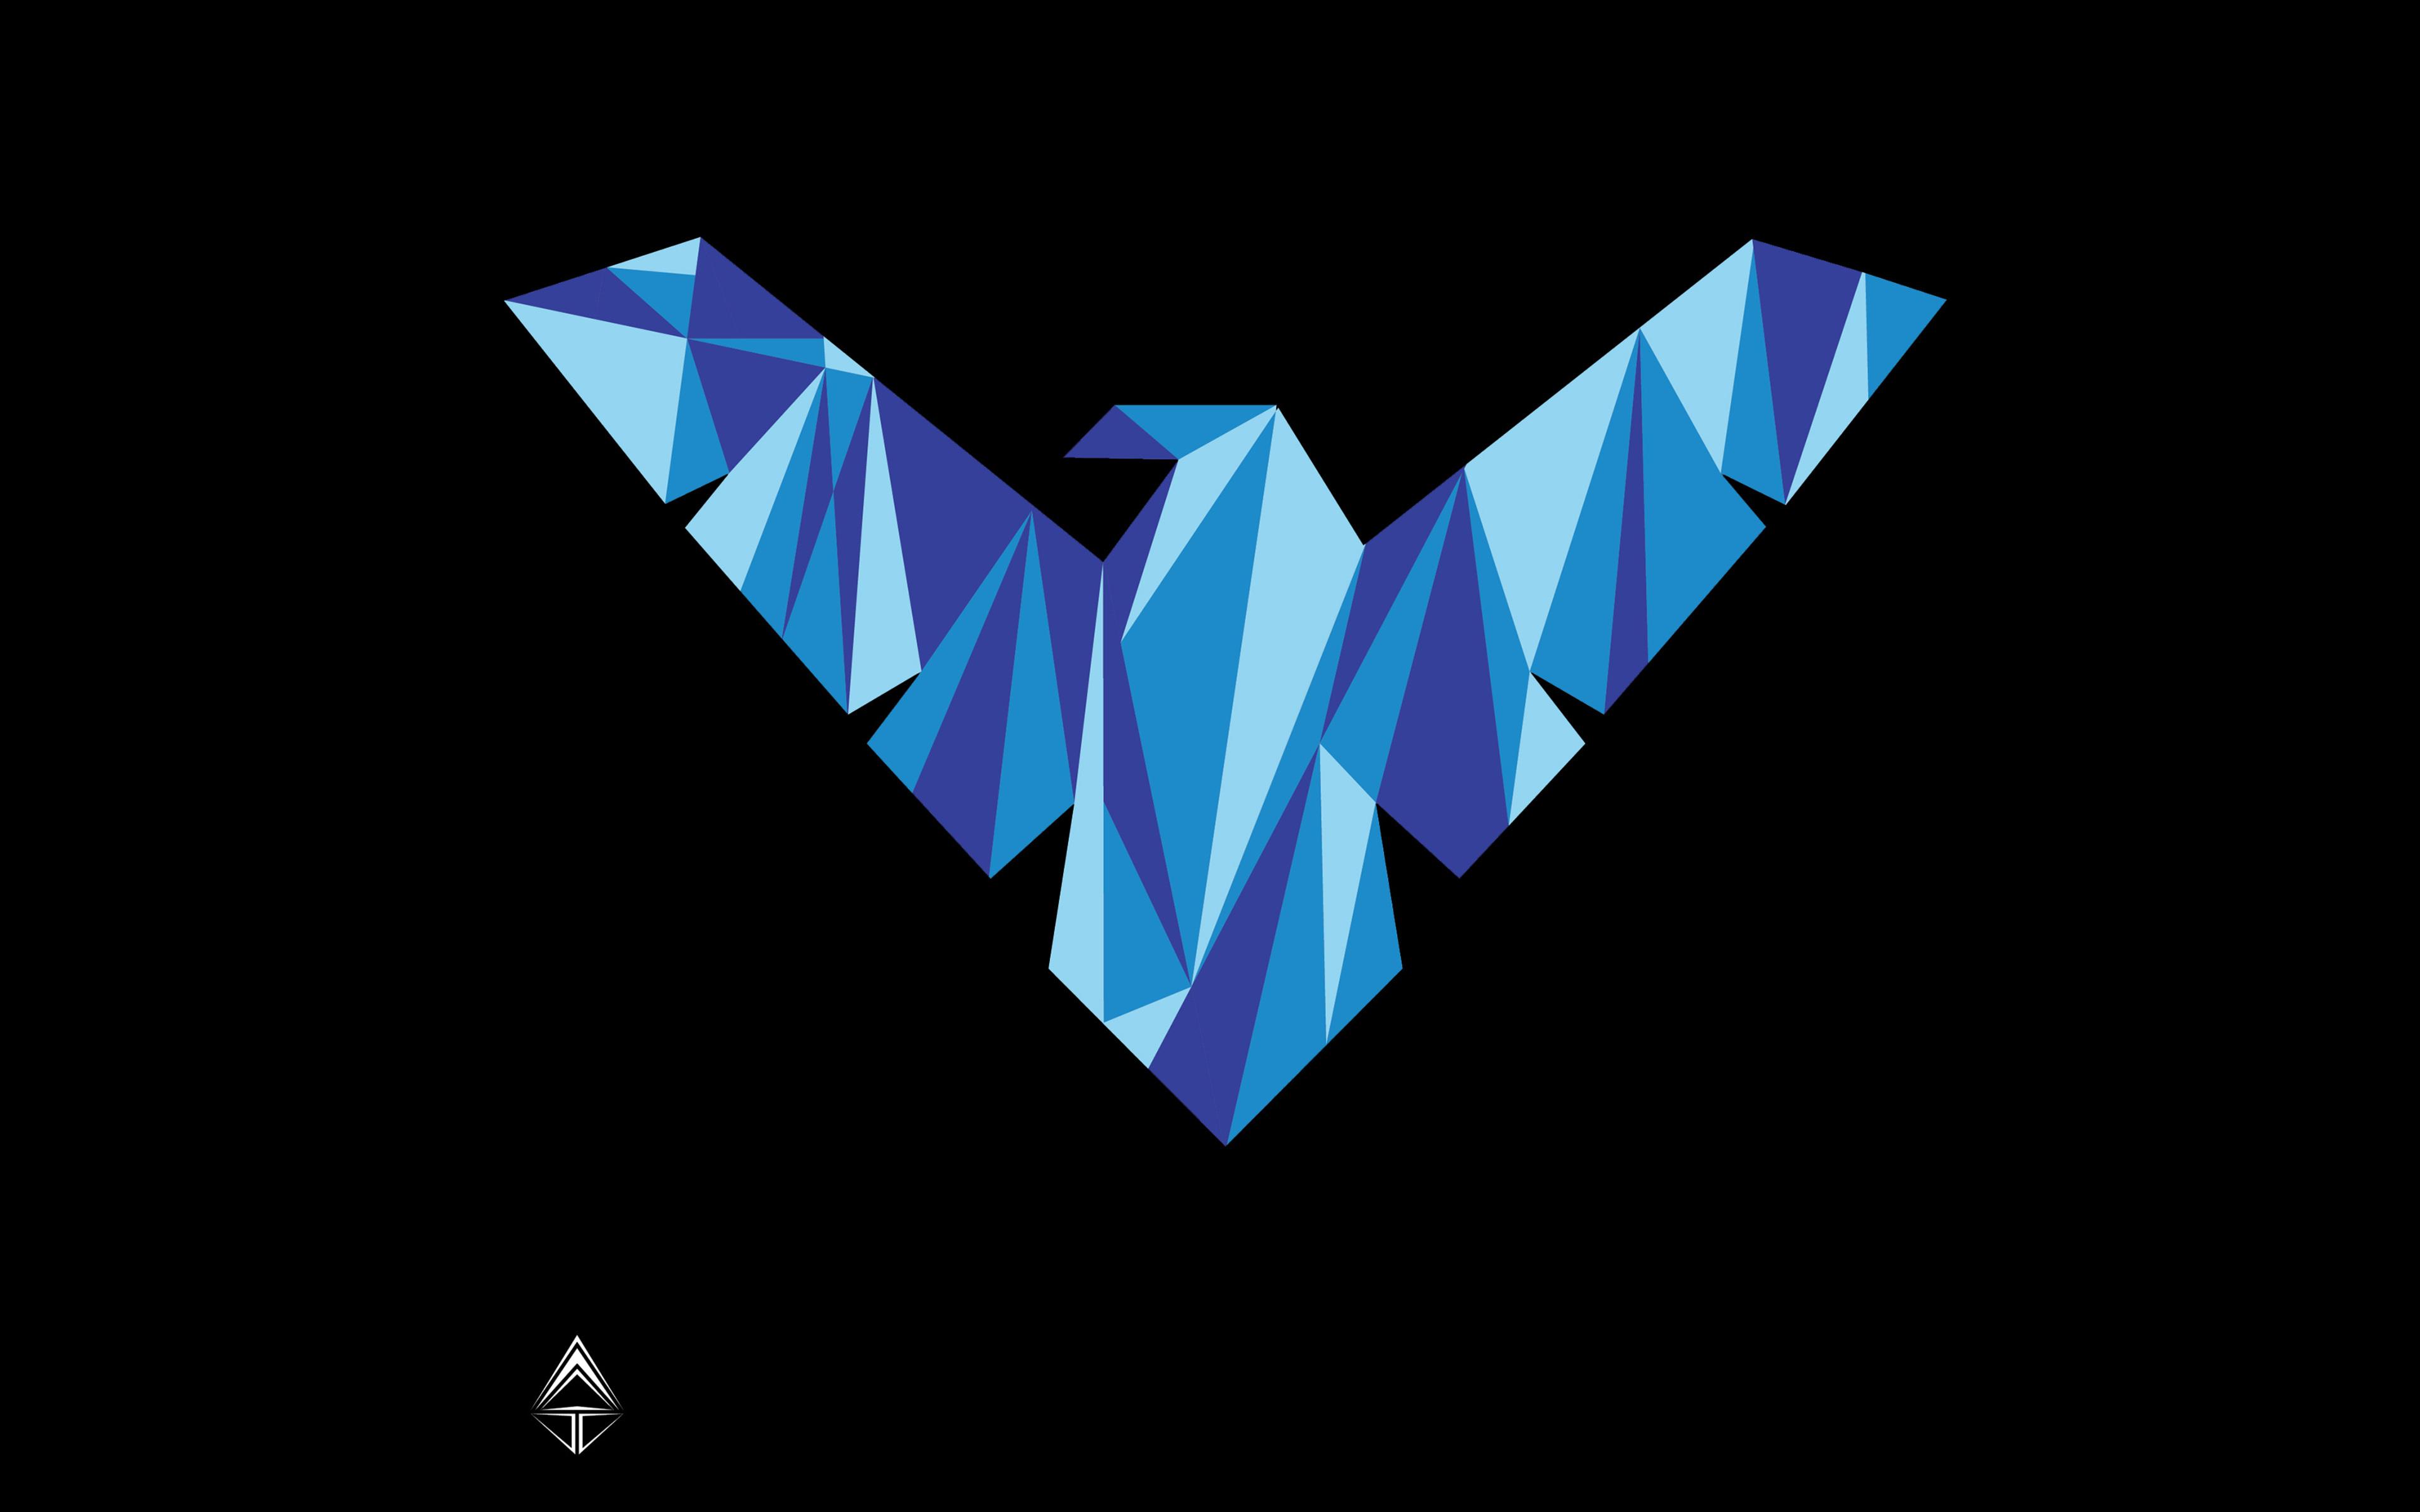 nightwing-logo-x6.jpg